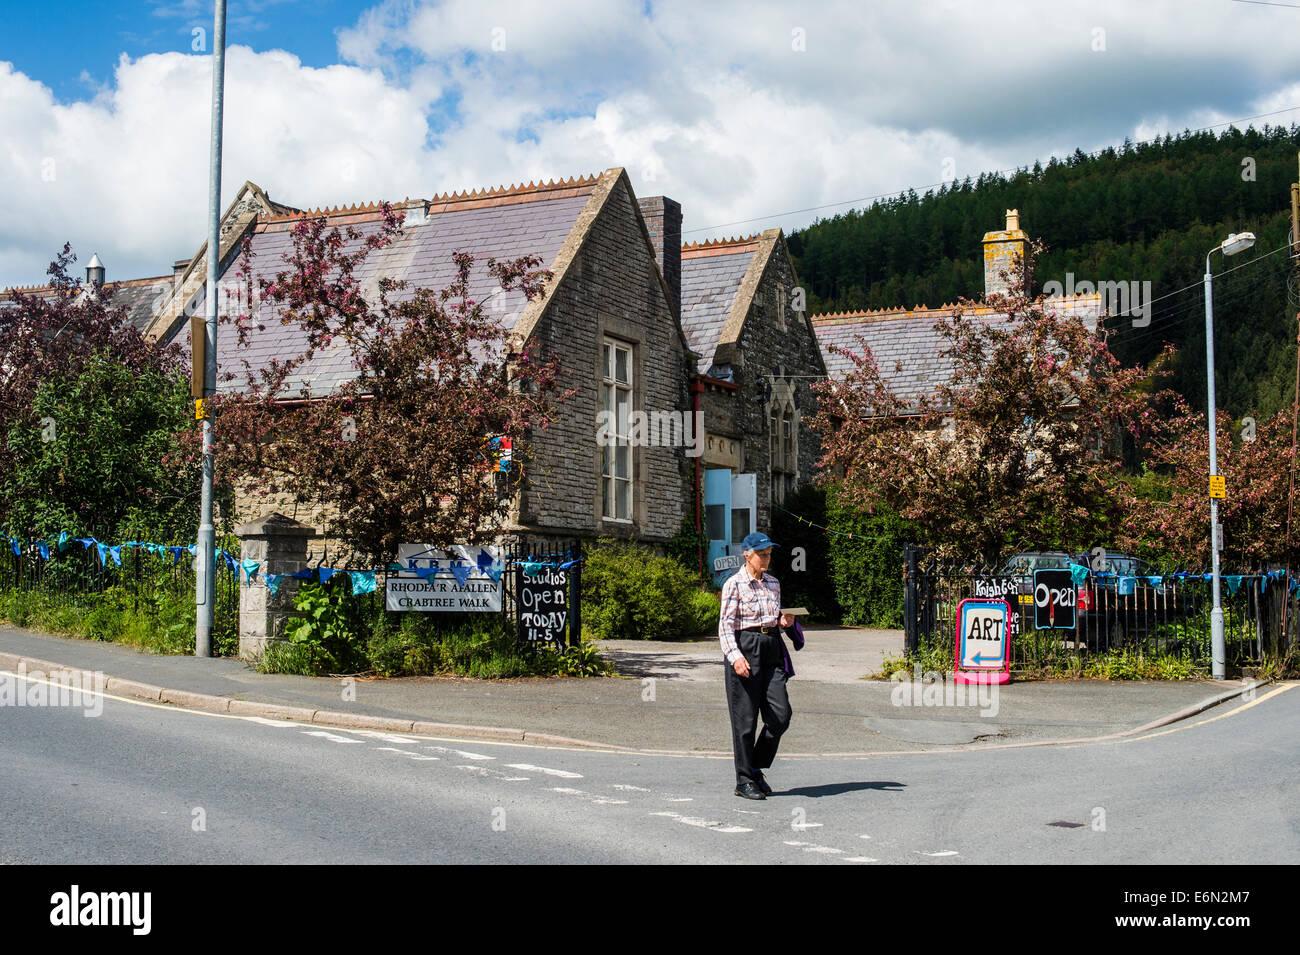 Exterior, The Old School Arts artists' studios, Knighton, Powys, Wales UK - Stock Image